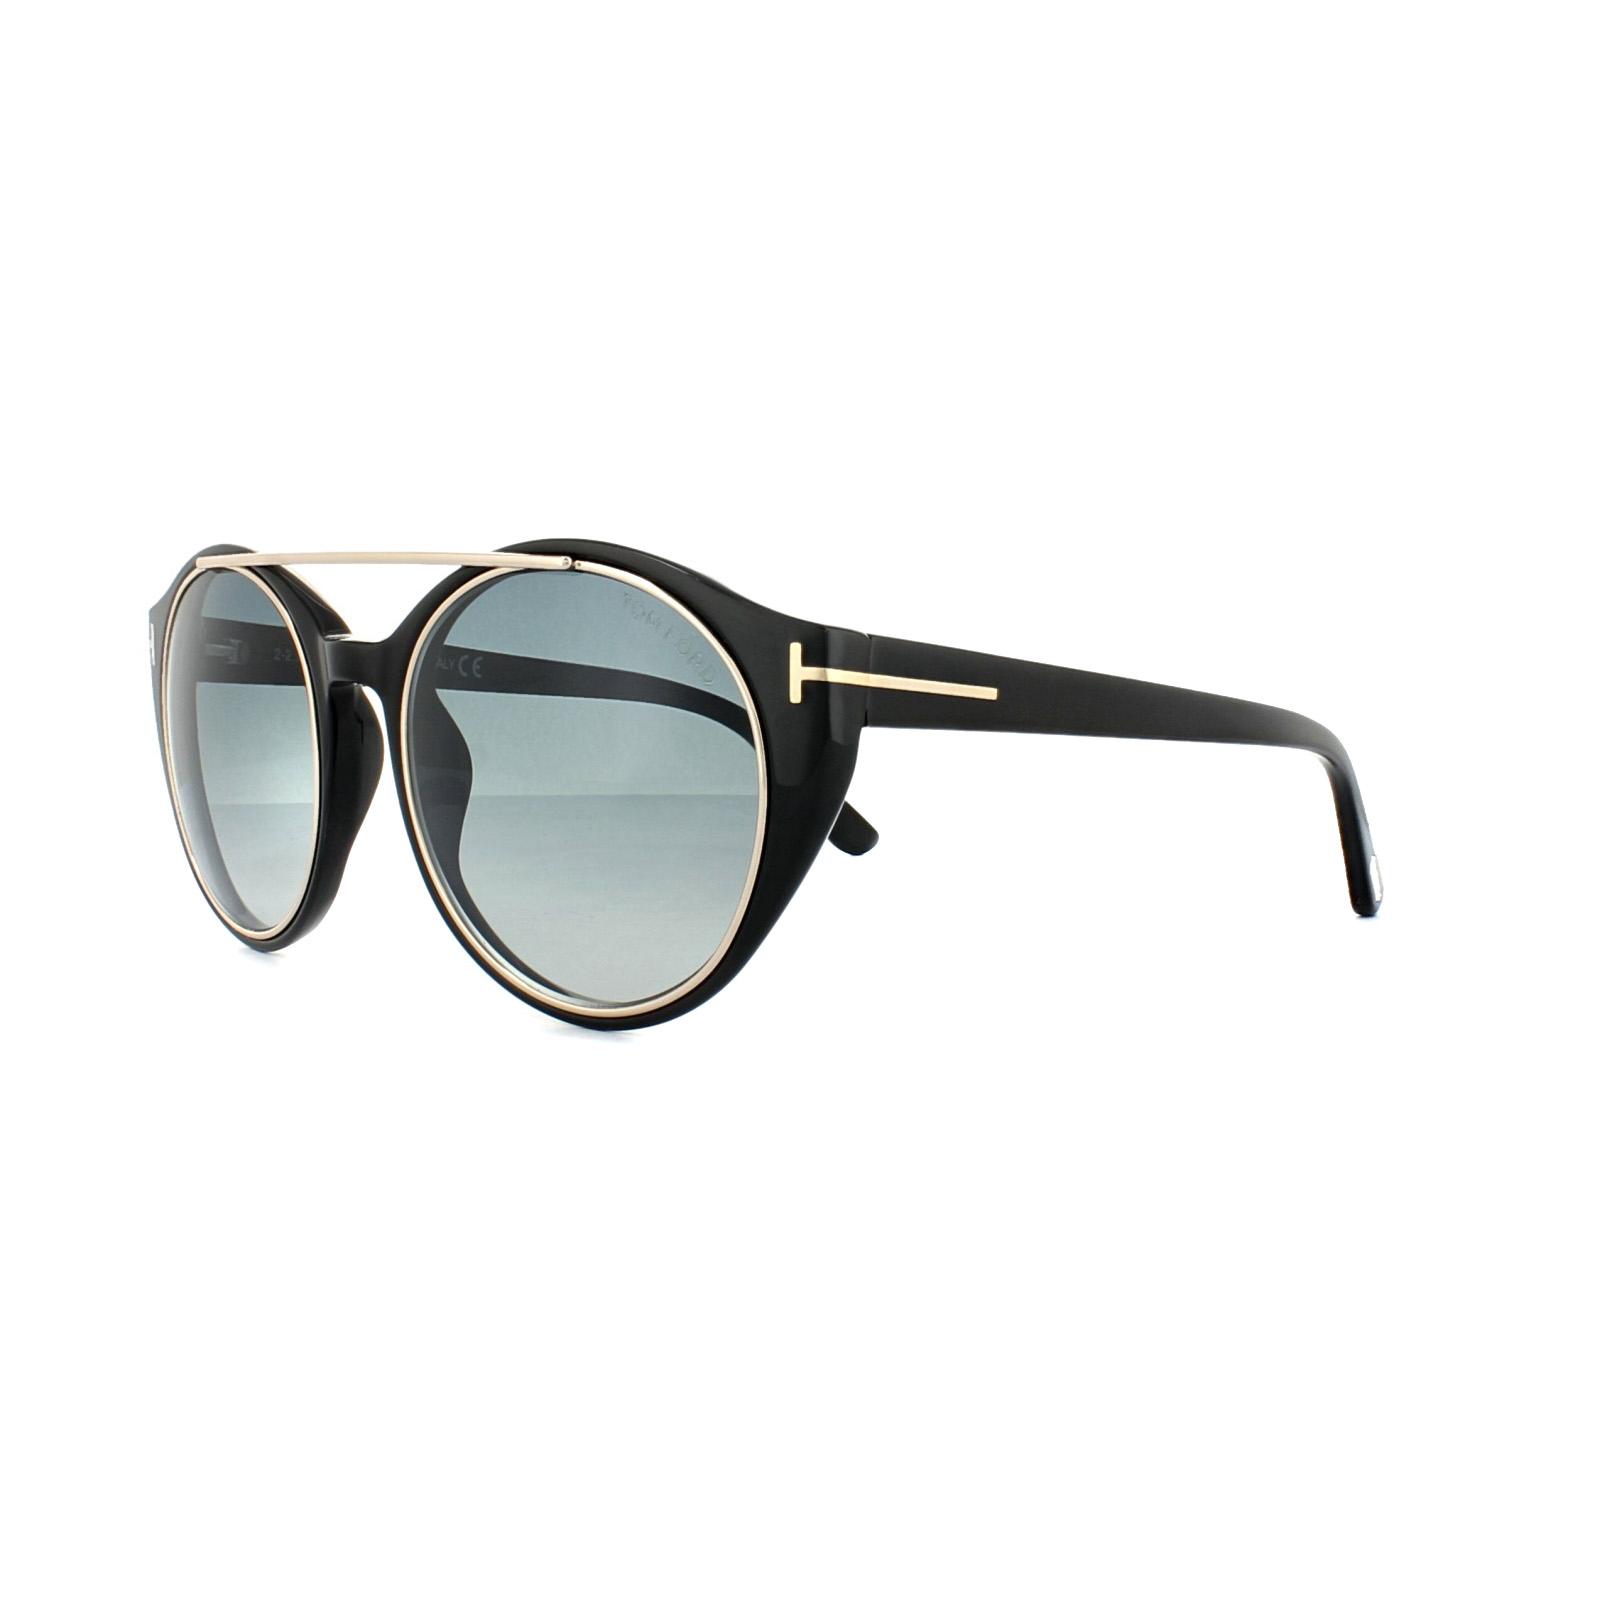 7cf06fb6f67c Cheap Tom Ford 0383 Joan Sunglasses - Discounted Sunglasses